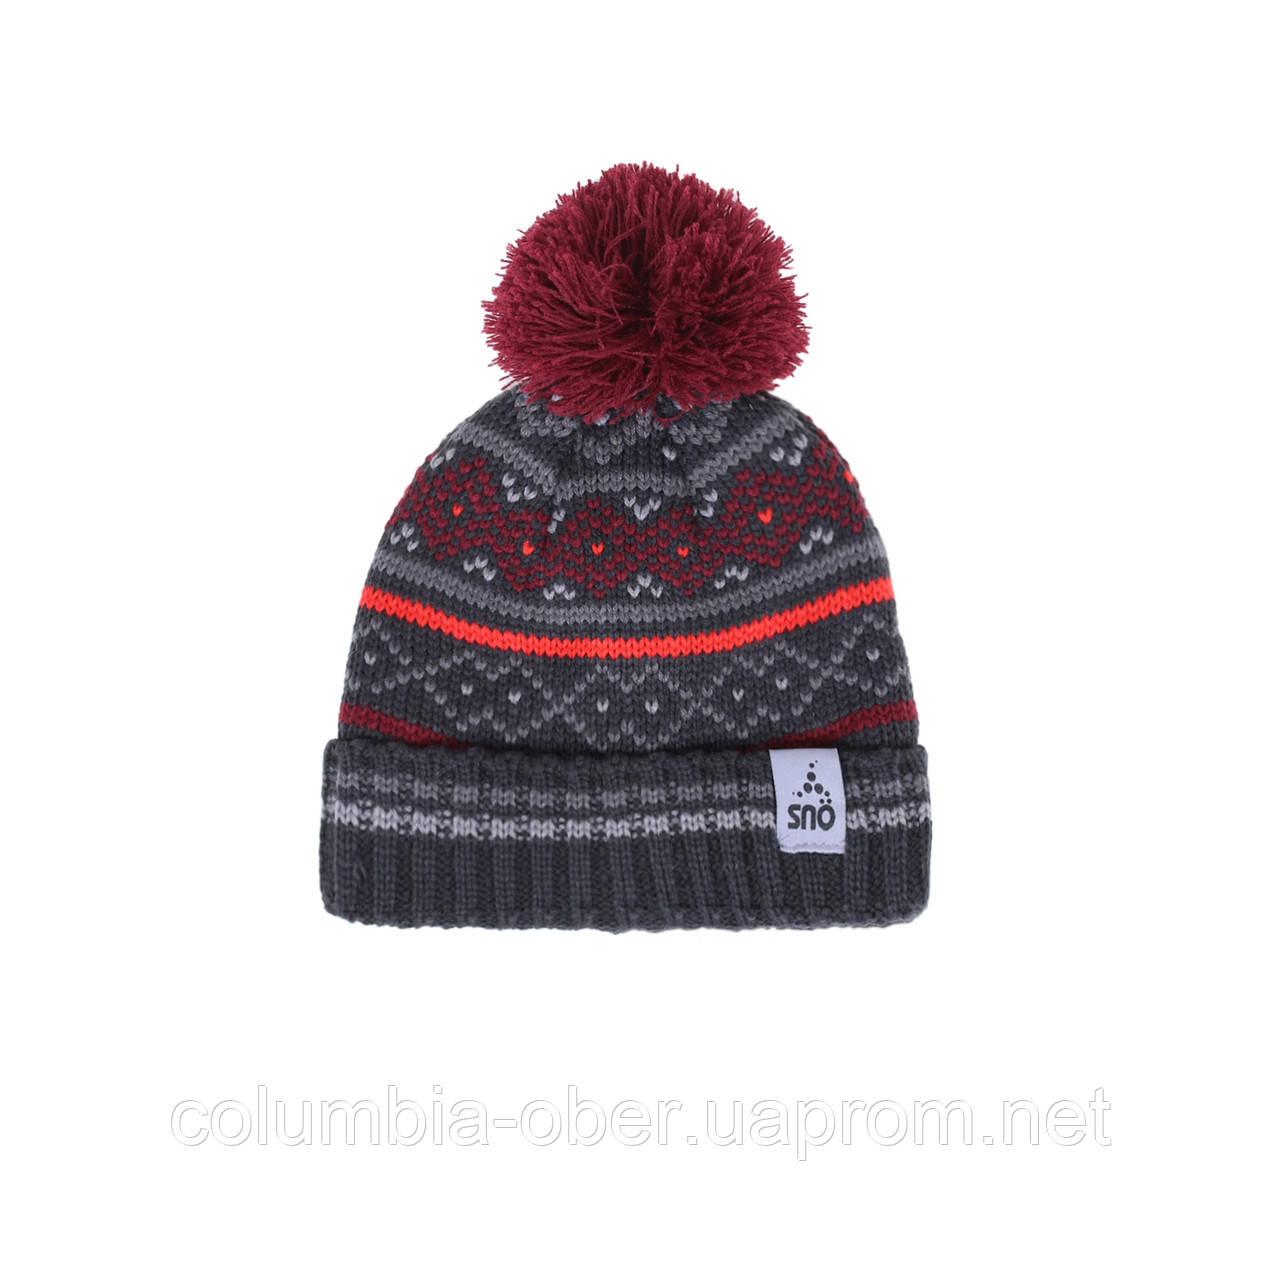 Зимняя шапка для мальчика SNO F18TU313 CARNET RED. Размер 54/56.